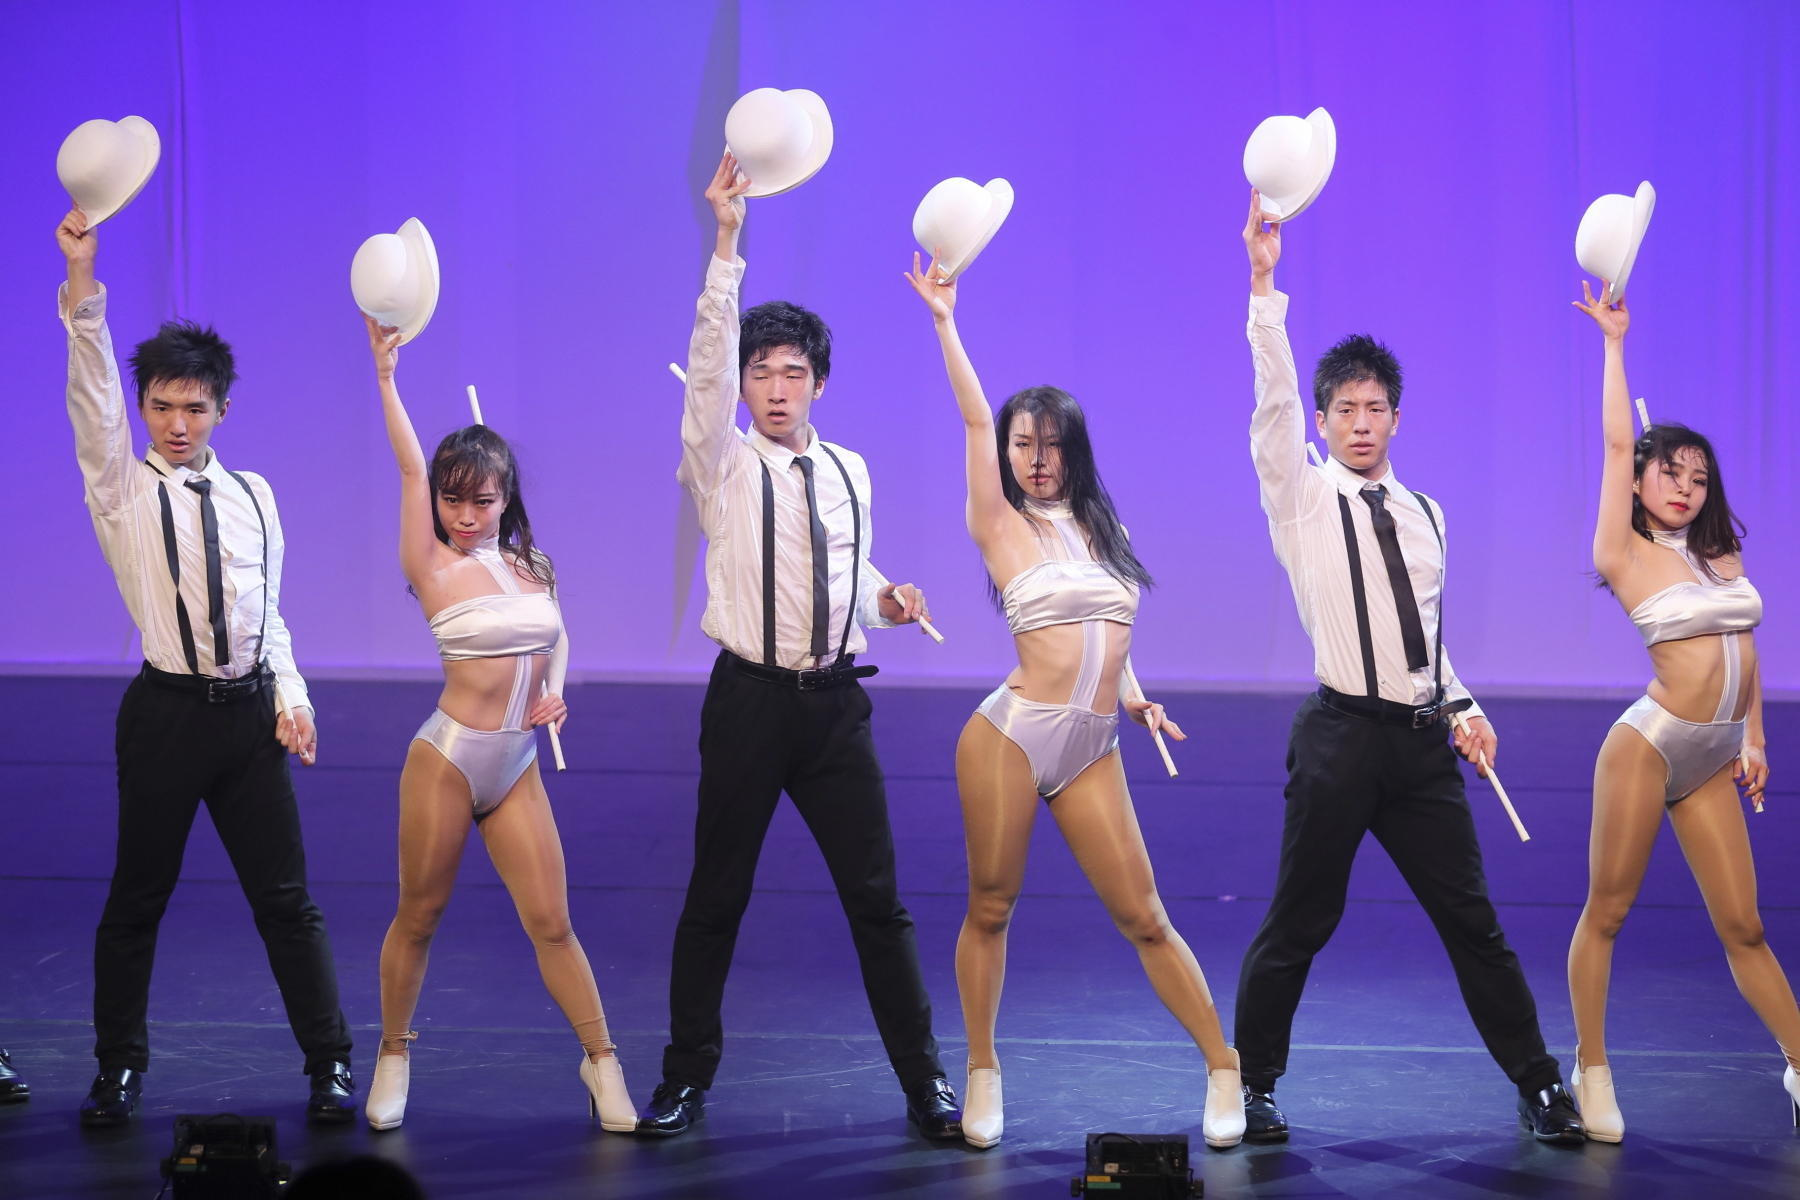 http://news.yoshimoto.co.jp/20180414112531-142666081b6c82ee3e3622cfb65e5660a49de873.jpg